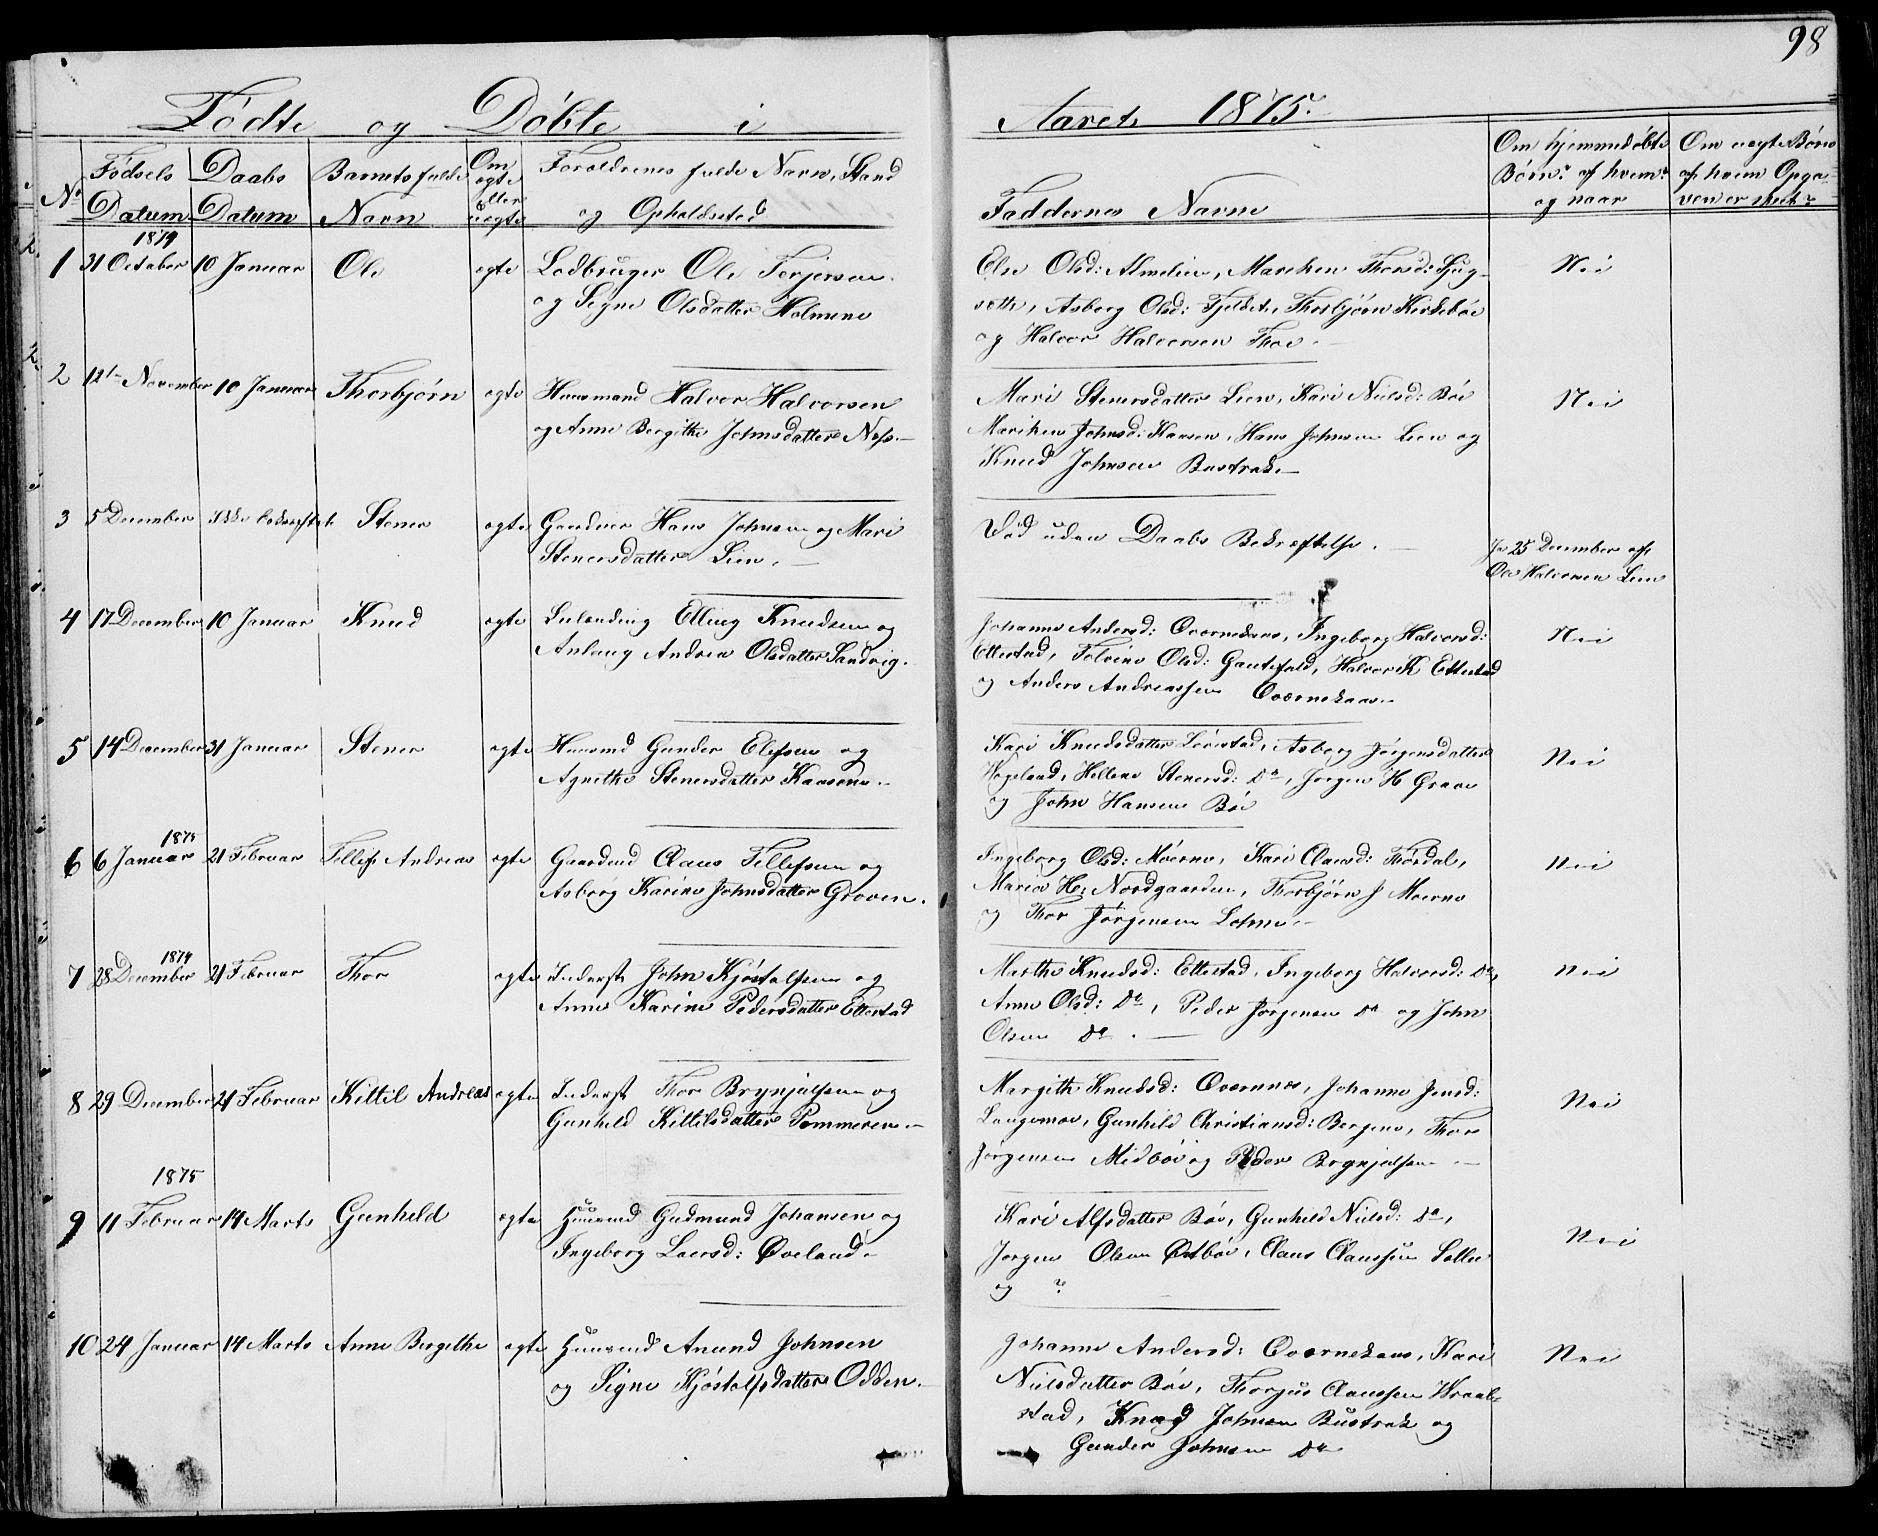 SAKO, Drangedal kirkebøker, G/Gb/L0001: Klokkerbok nr. II 1, 1856-1894, s. 98